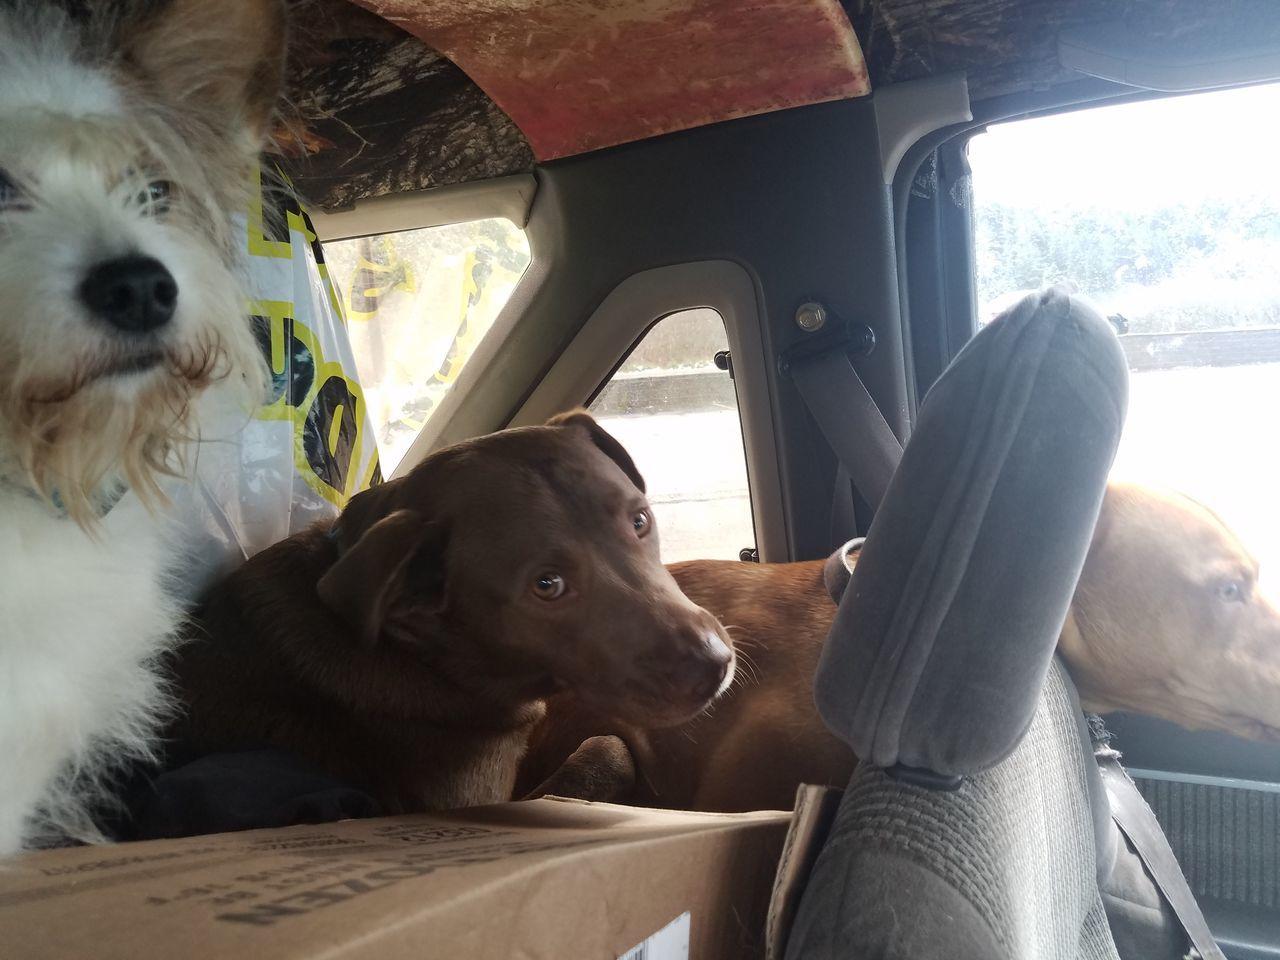 vehicle interior, car interior, dog, car, pets, transportation, mammal, domestic animals, vehicle seat, animal themes, sitting, mode of transport, land vehicle, day, one animal, portrait, no people, close-up